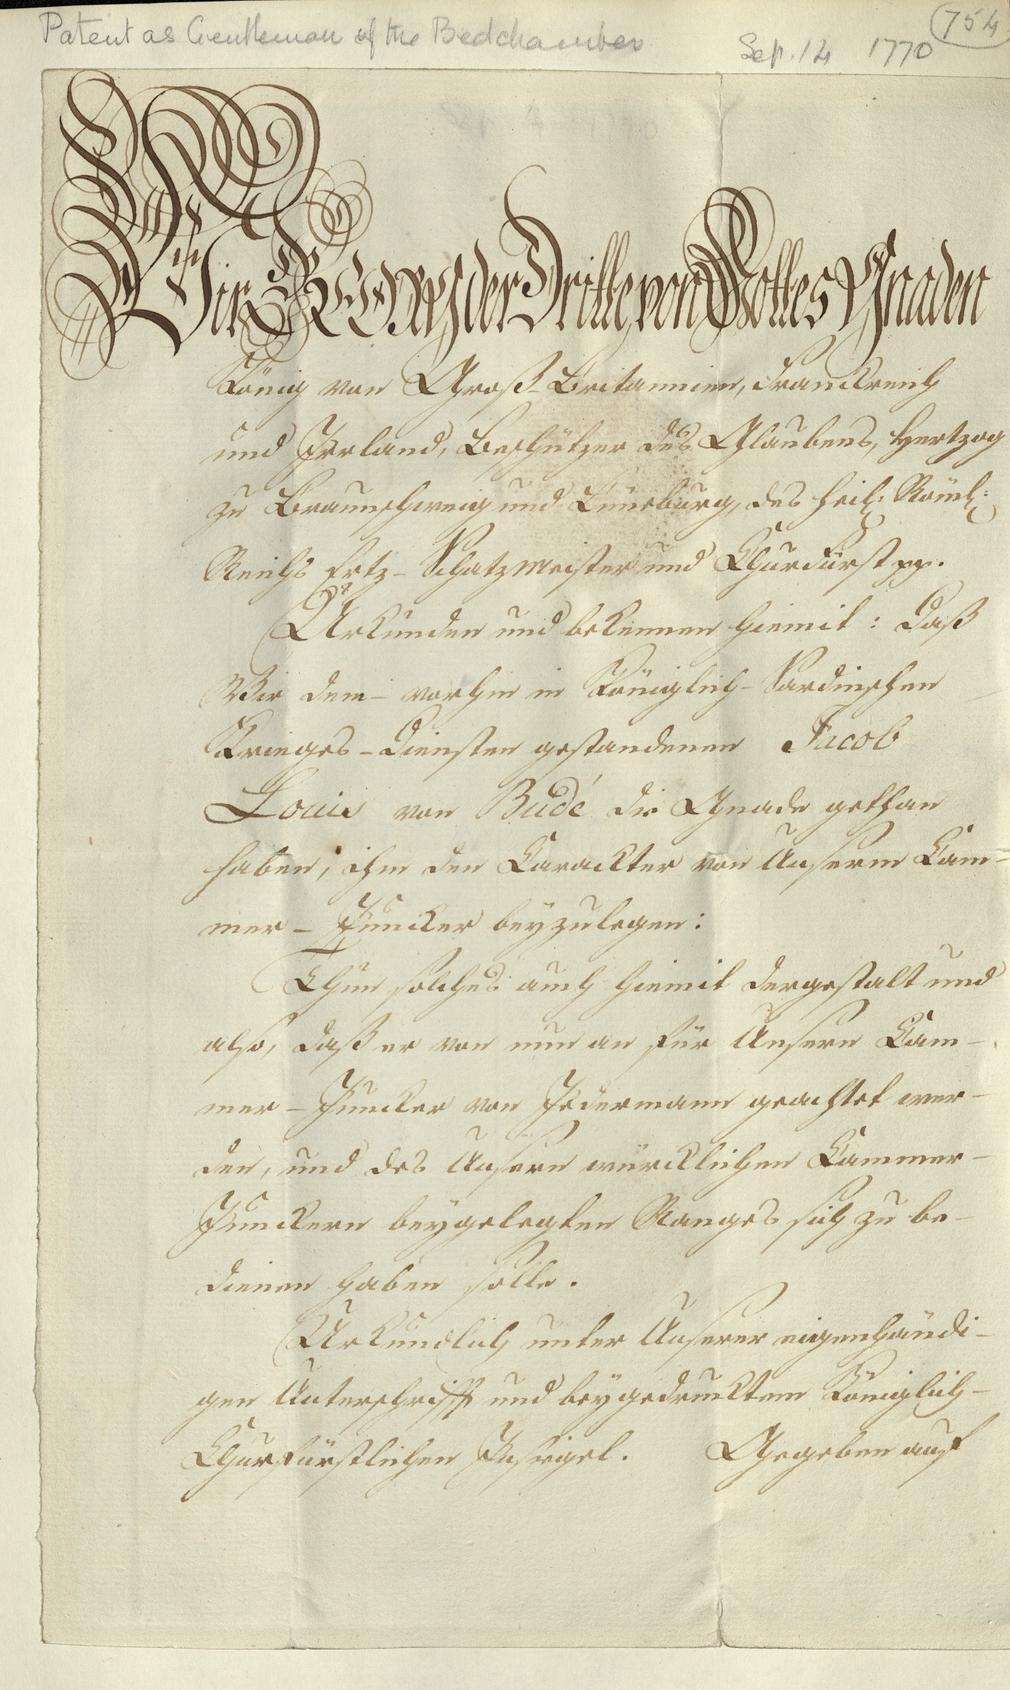 Manuscript pattent relating to General Jacob de Budé